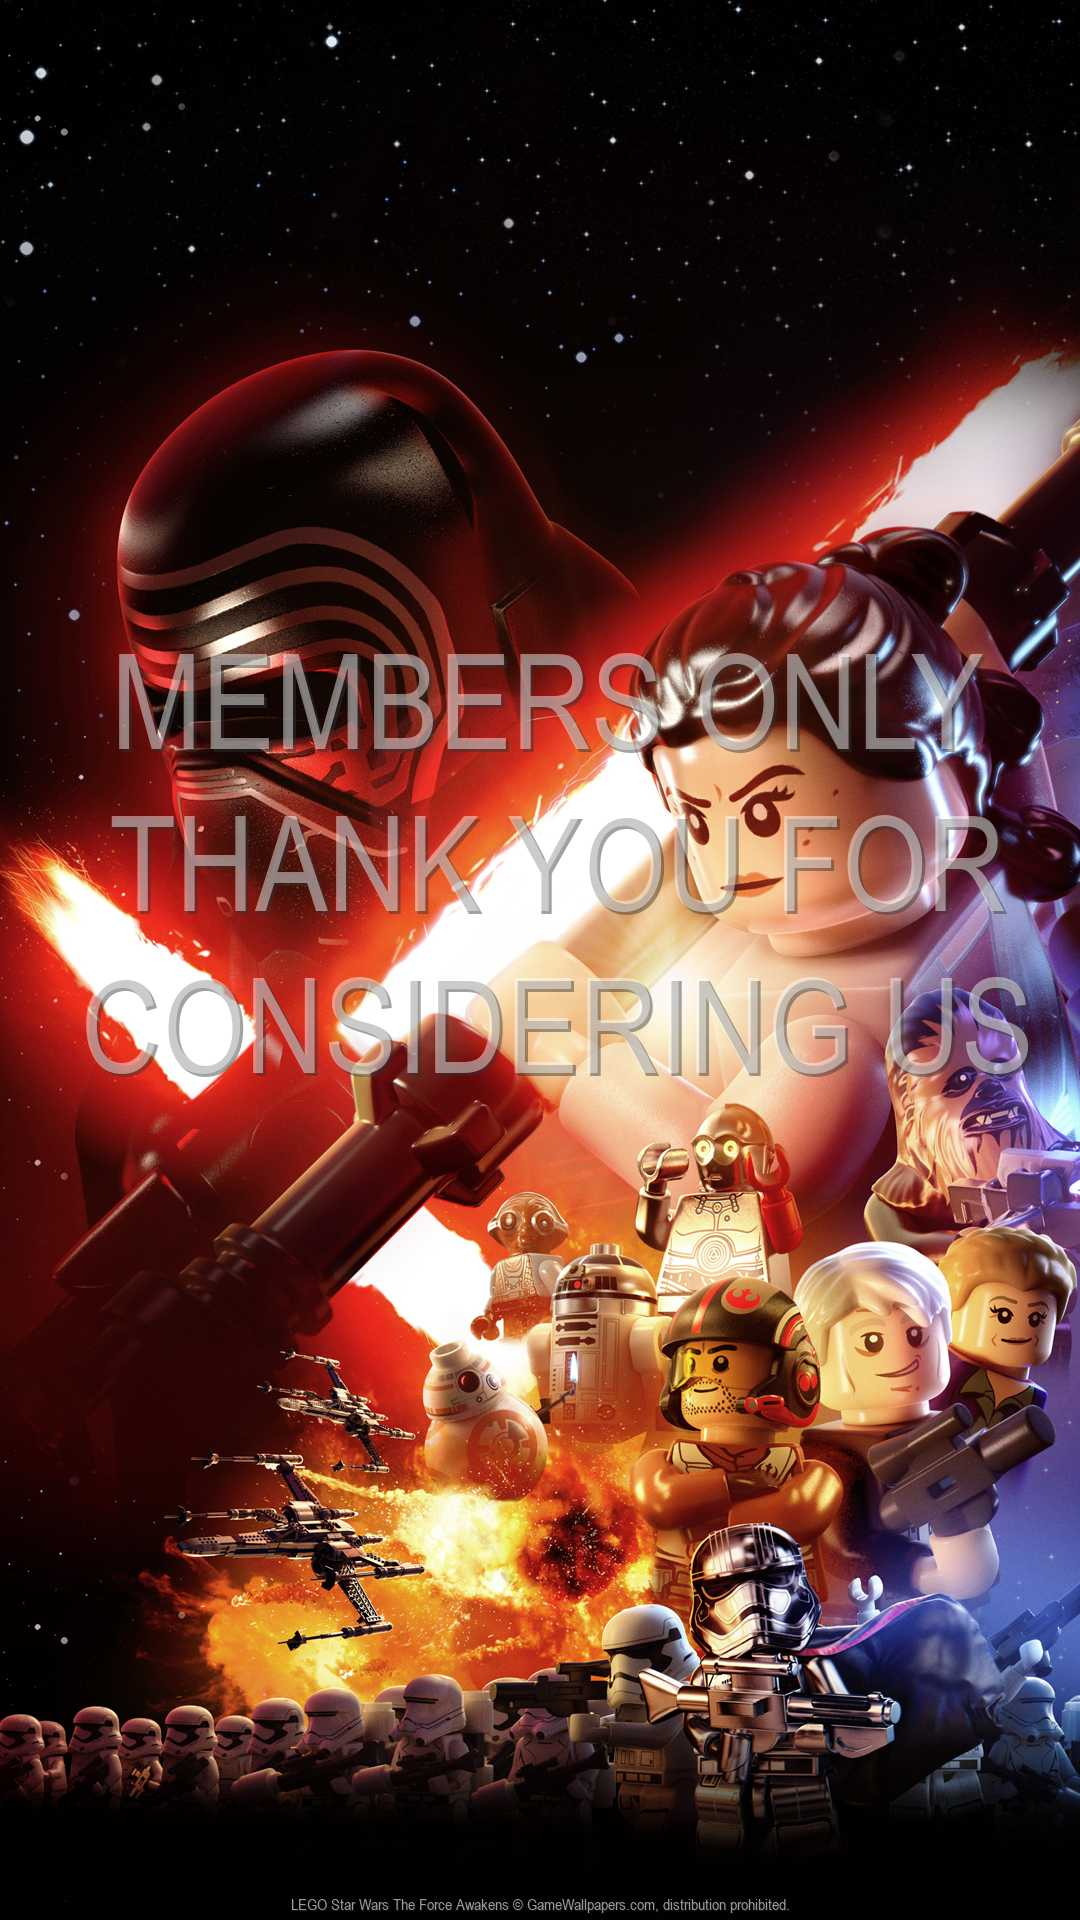 Lego Star Wars The Force Awakens Wallpaper 01 1080p Vertical